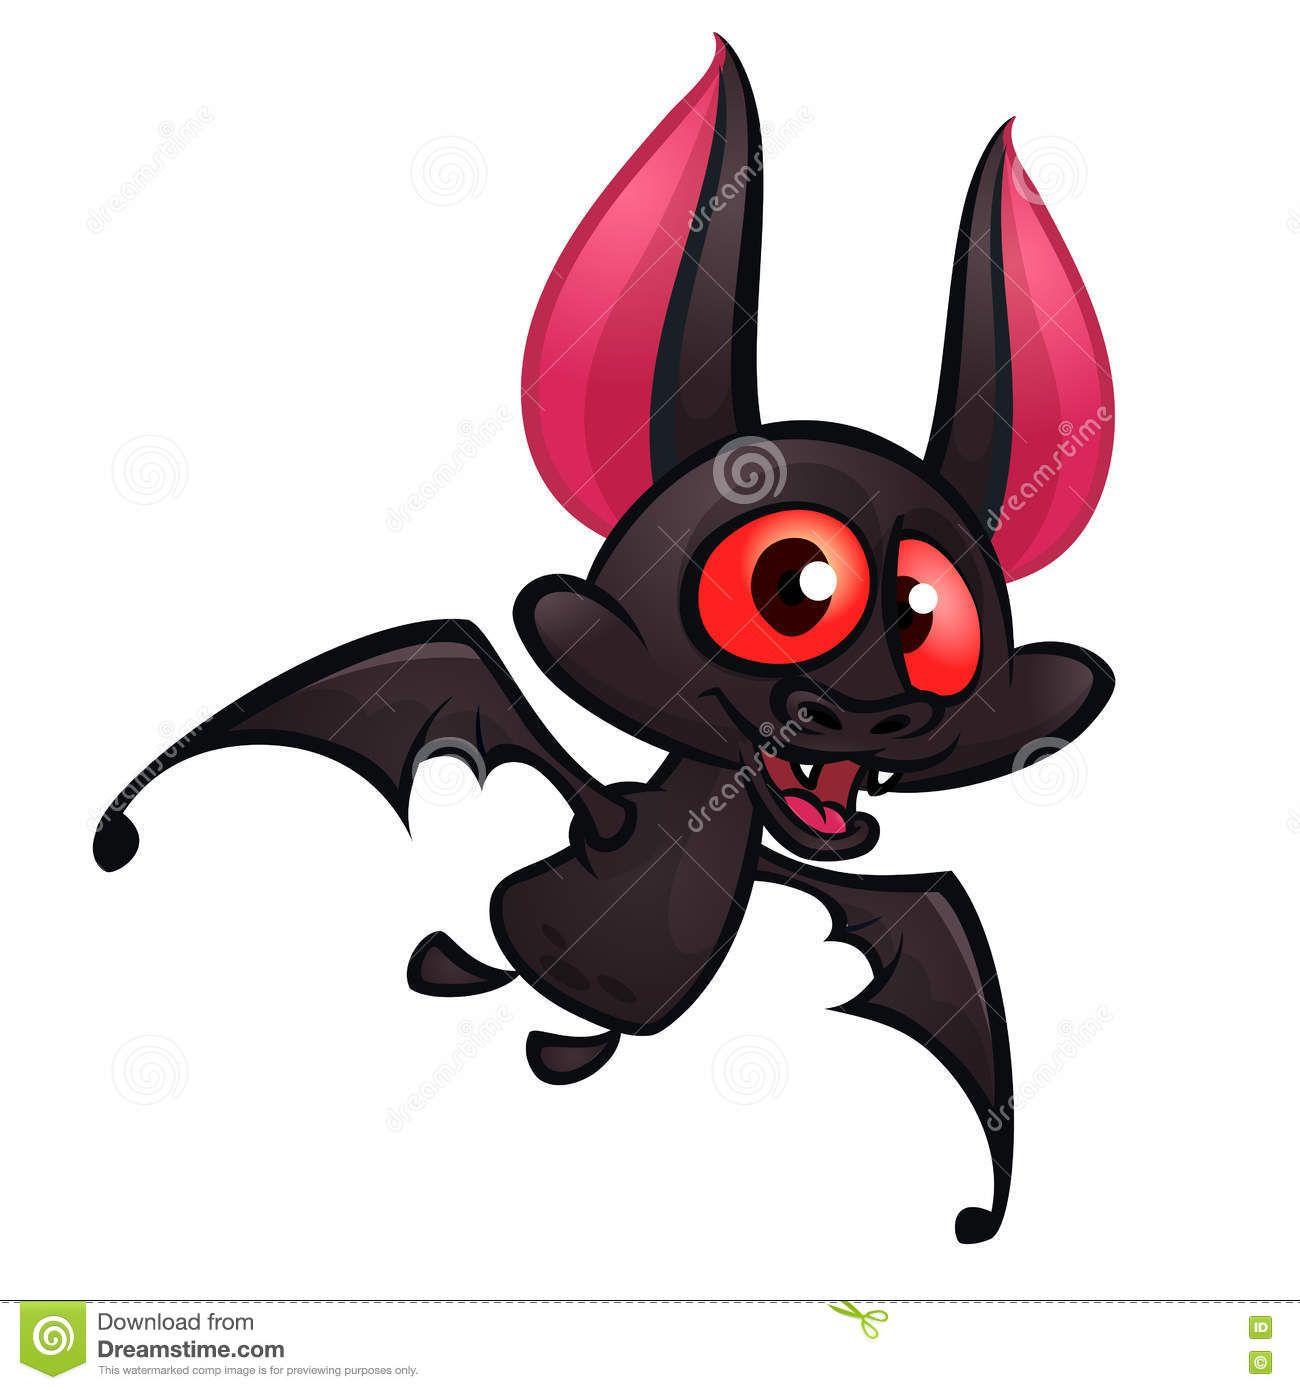 Illustration Of Cute Cartoon Halloween Bat Flying Download From